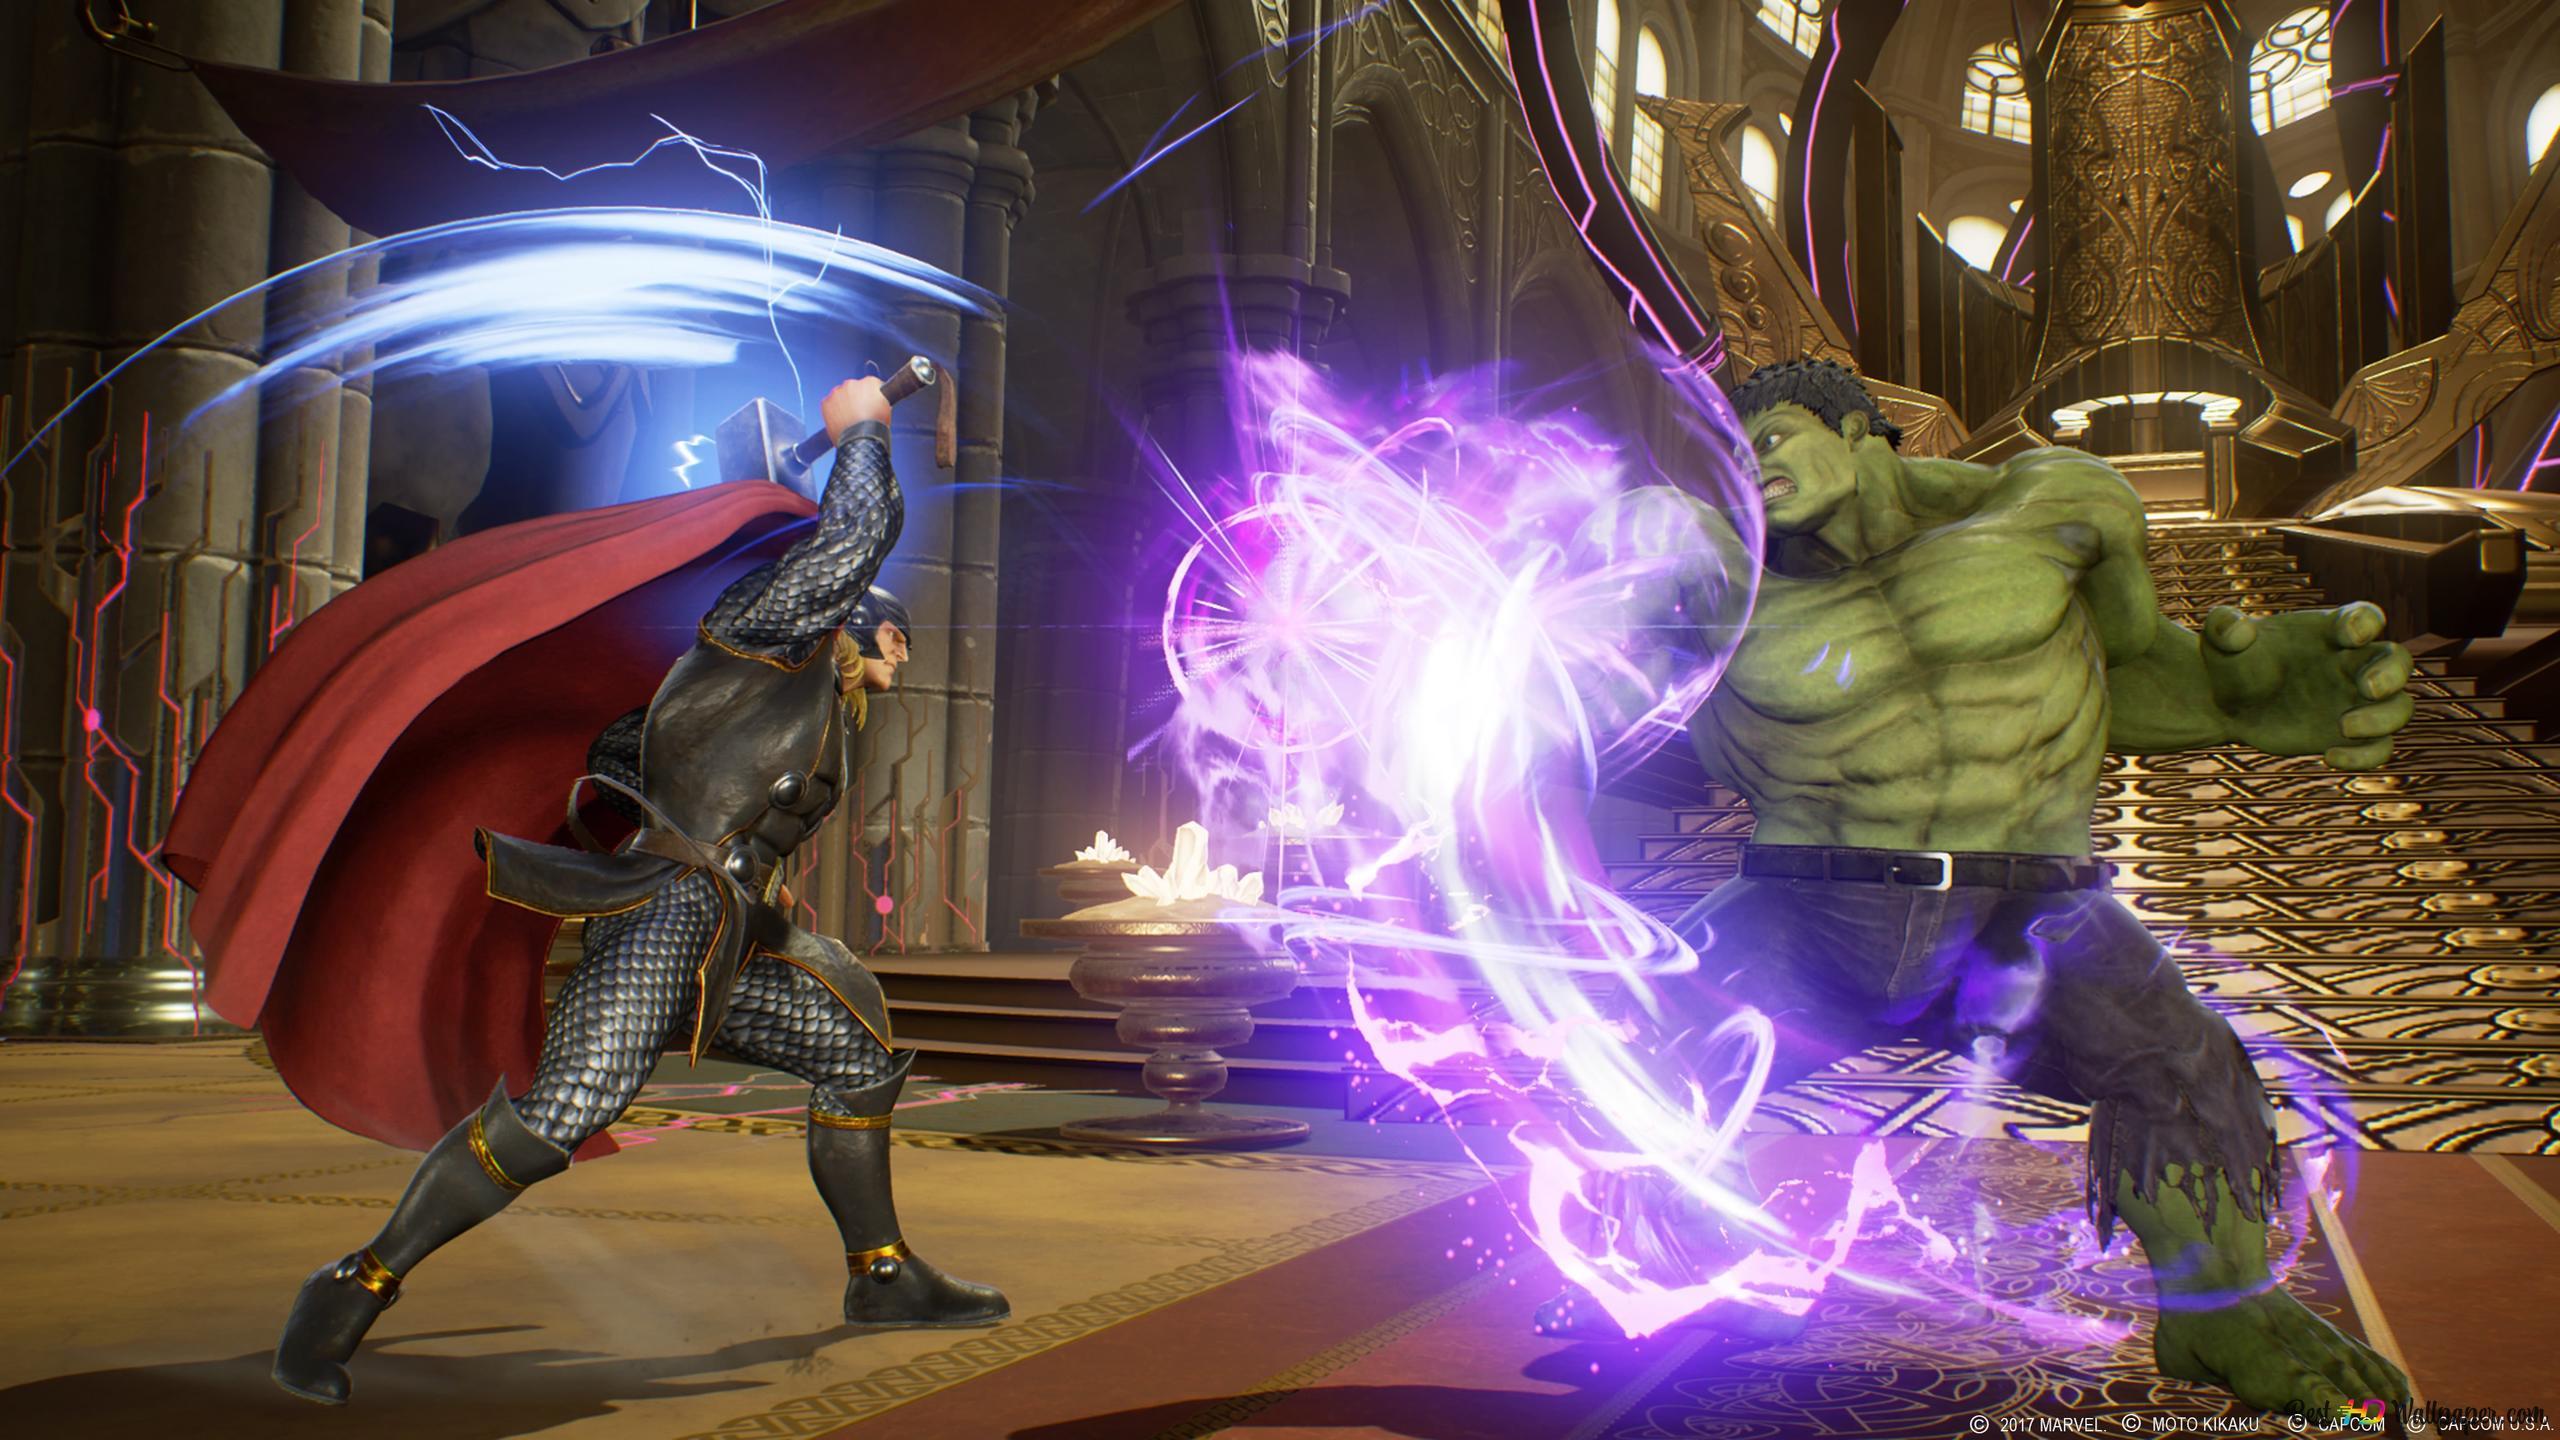 Marvel Vs Capcom Infinite Hulk Vs Thor Hd Wallpaper Download